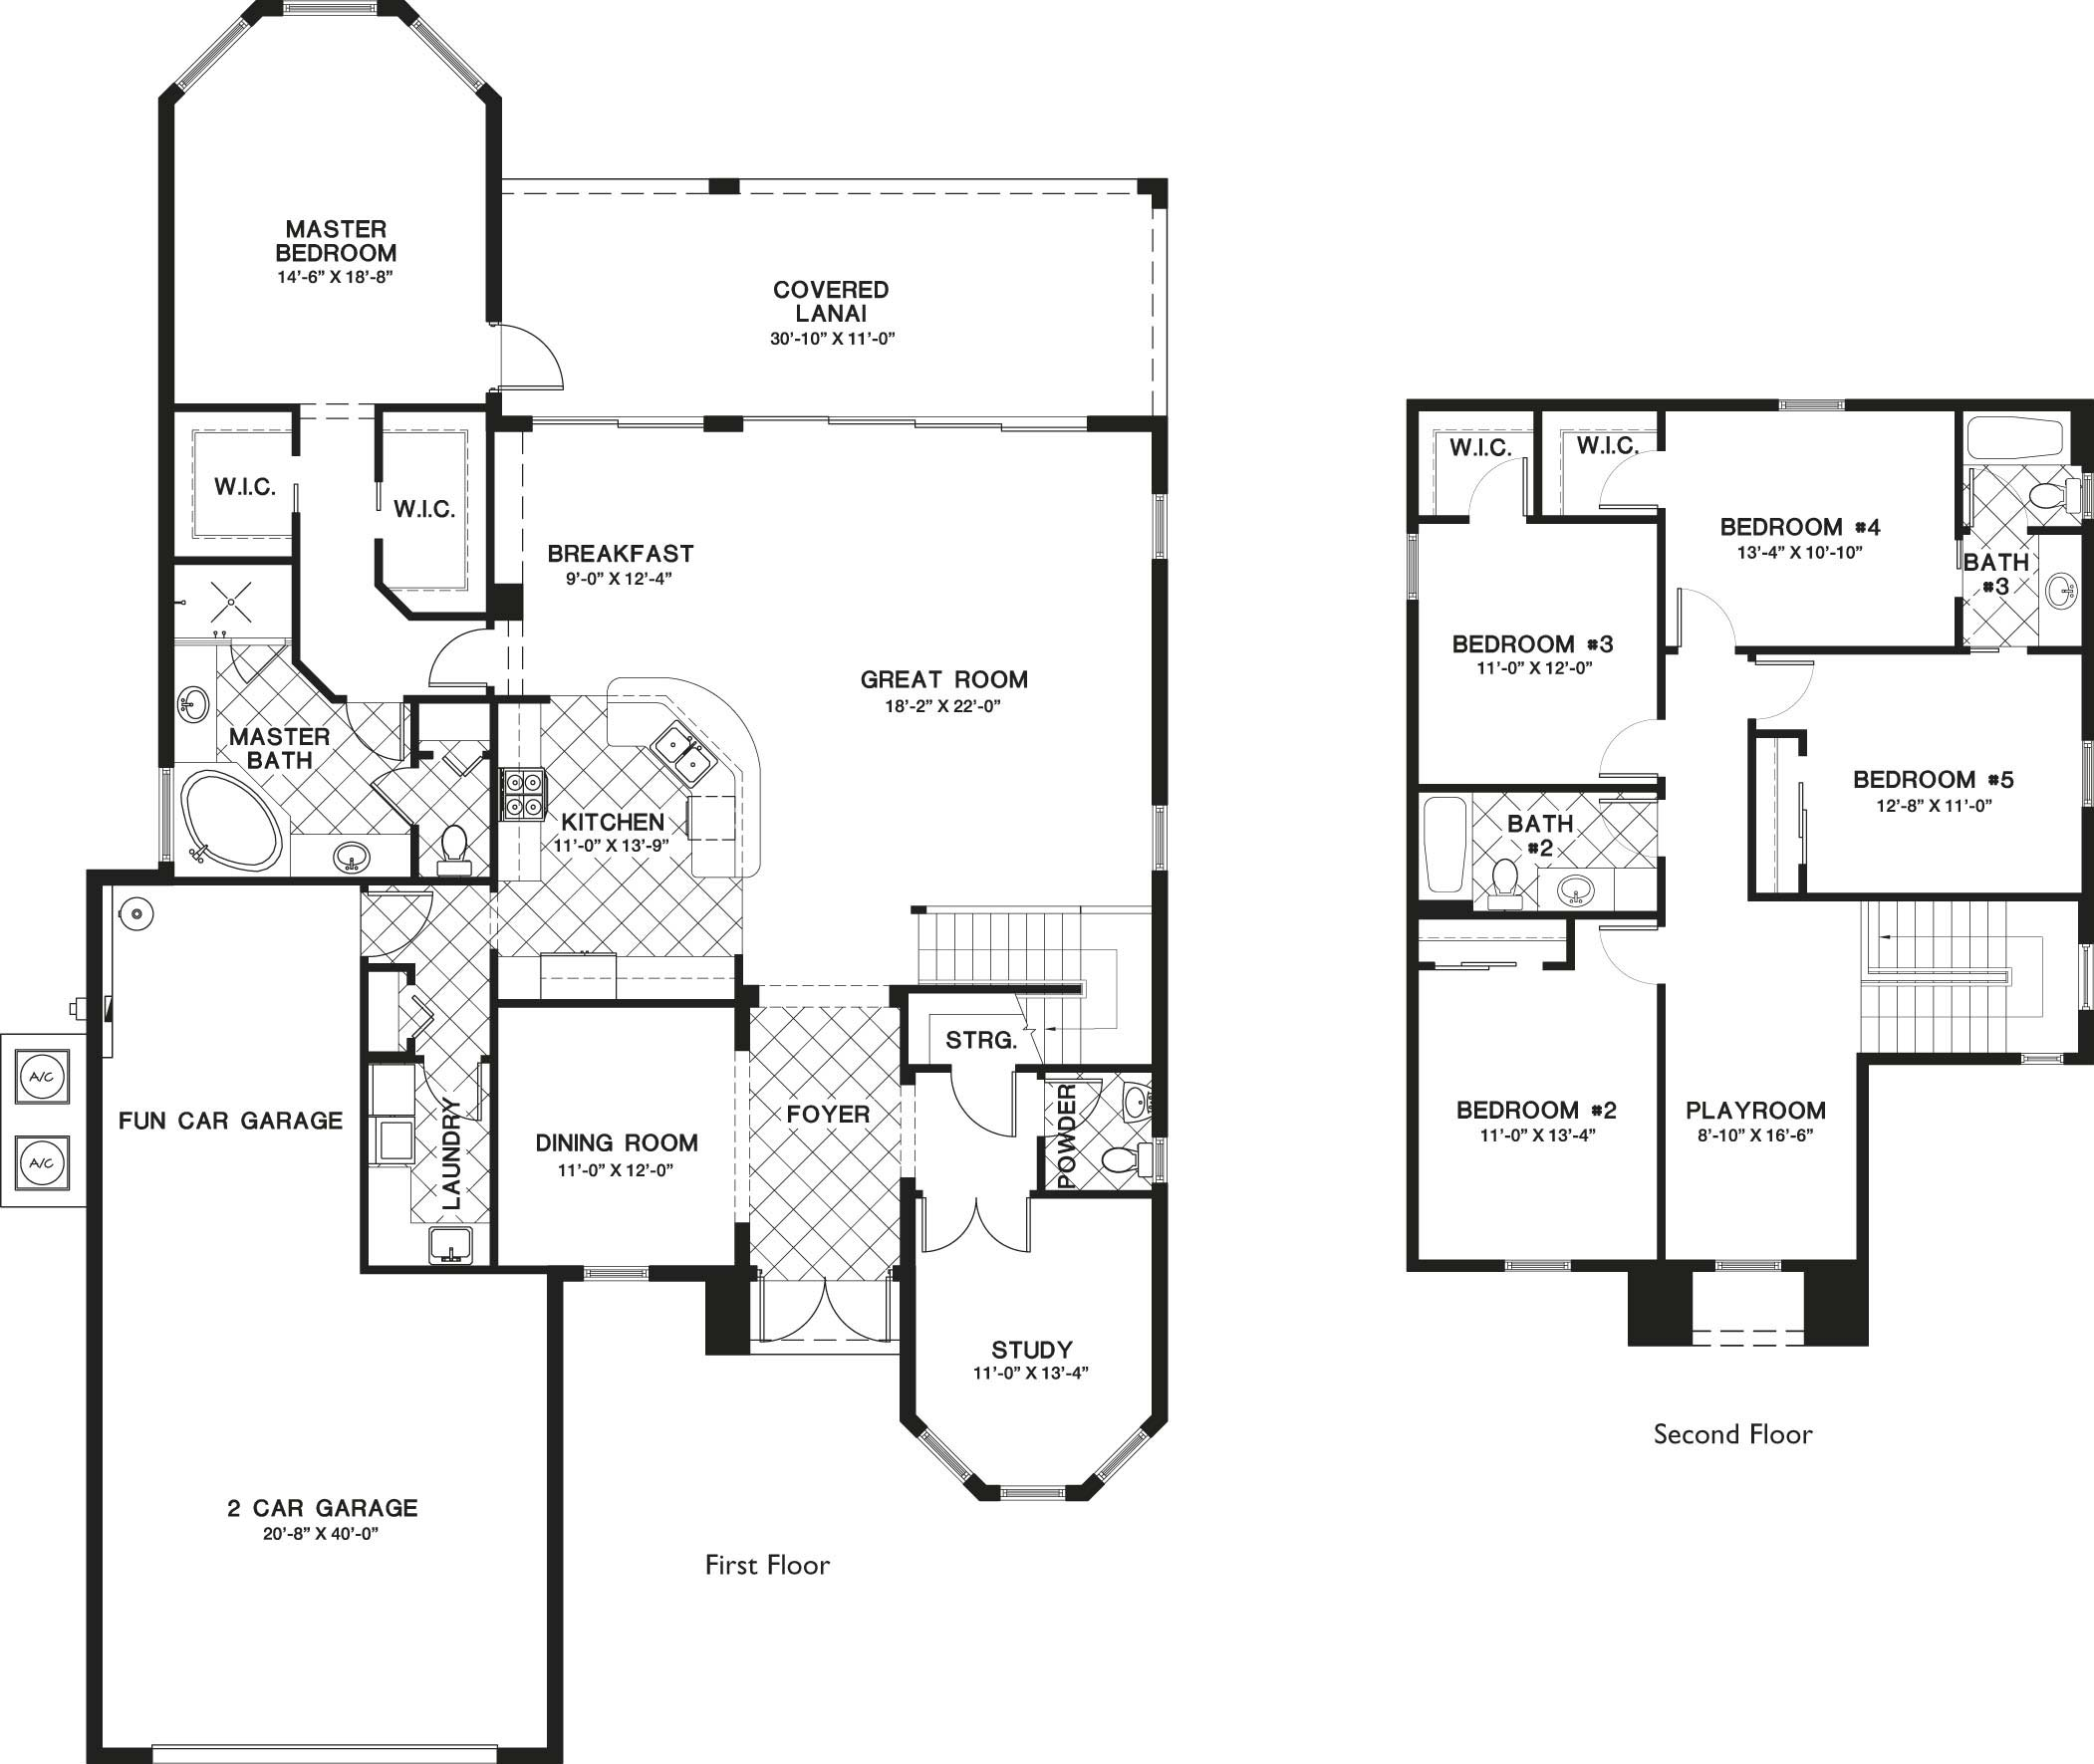 Corleone I Floor Plan In Paseo, 5 Bedroom, 3 1/2 Bath